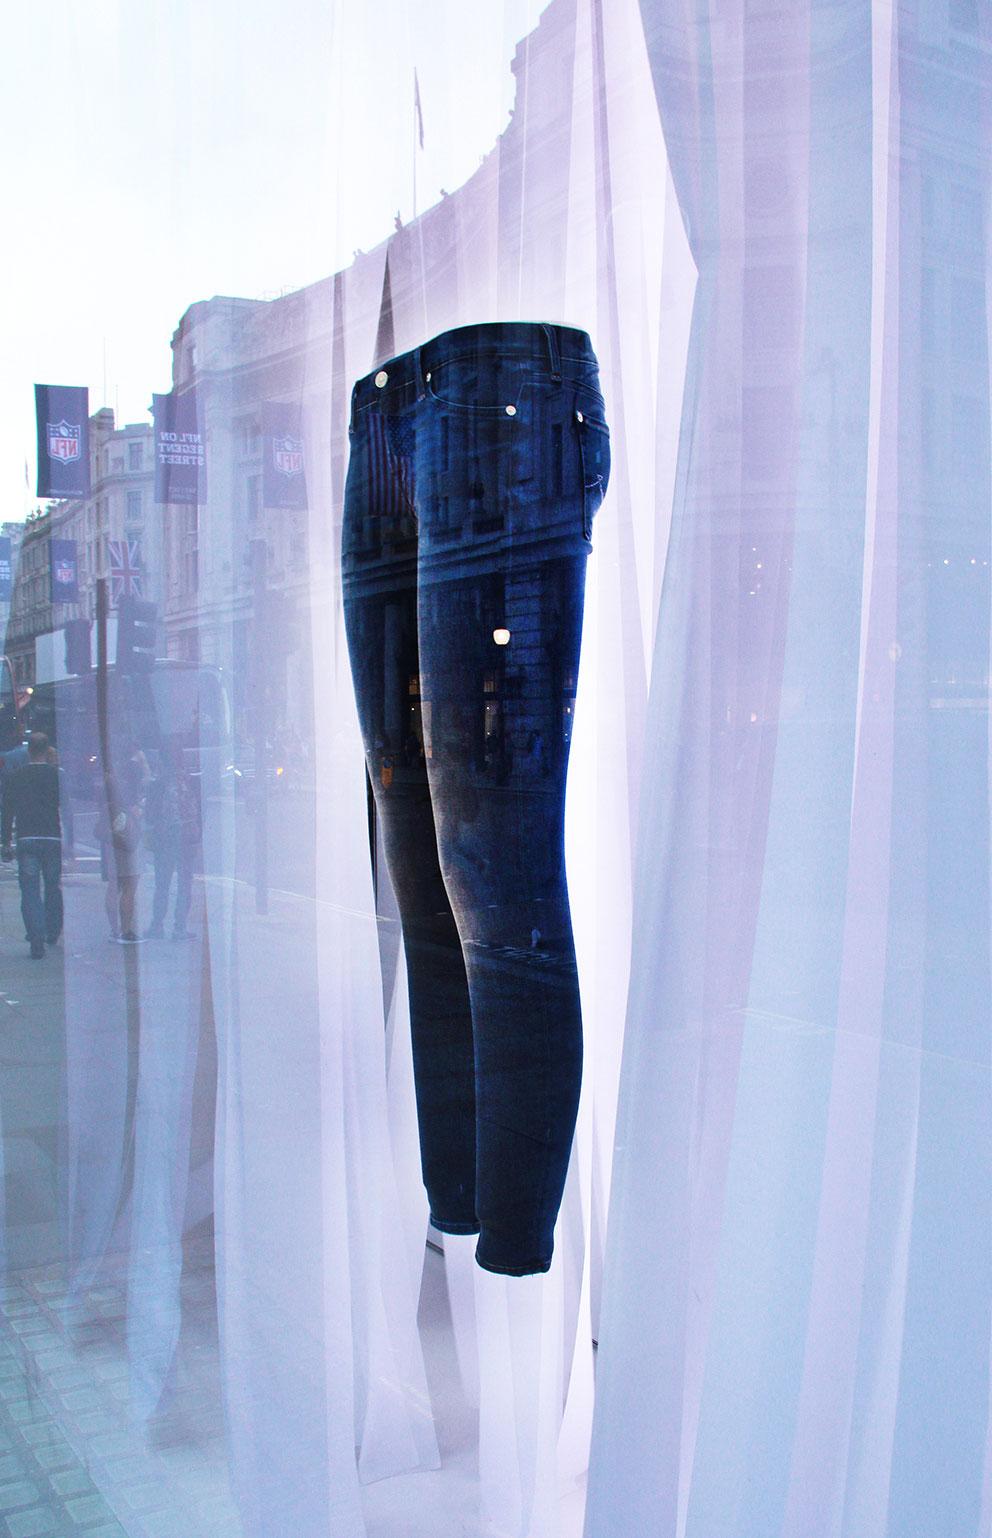 KSR ARCHITECTS' Regent Street Window